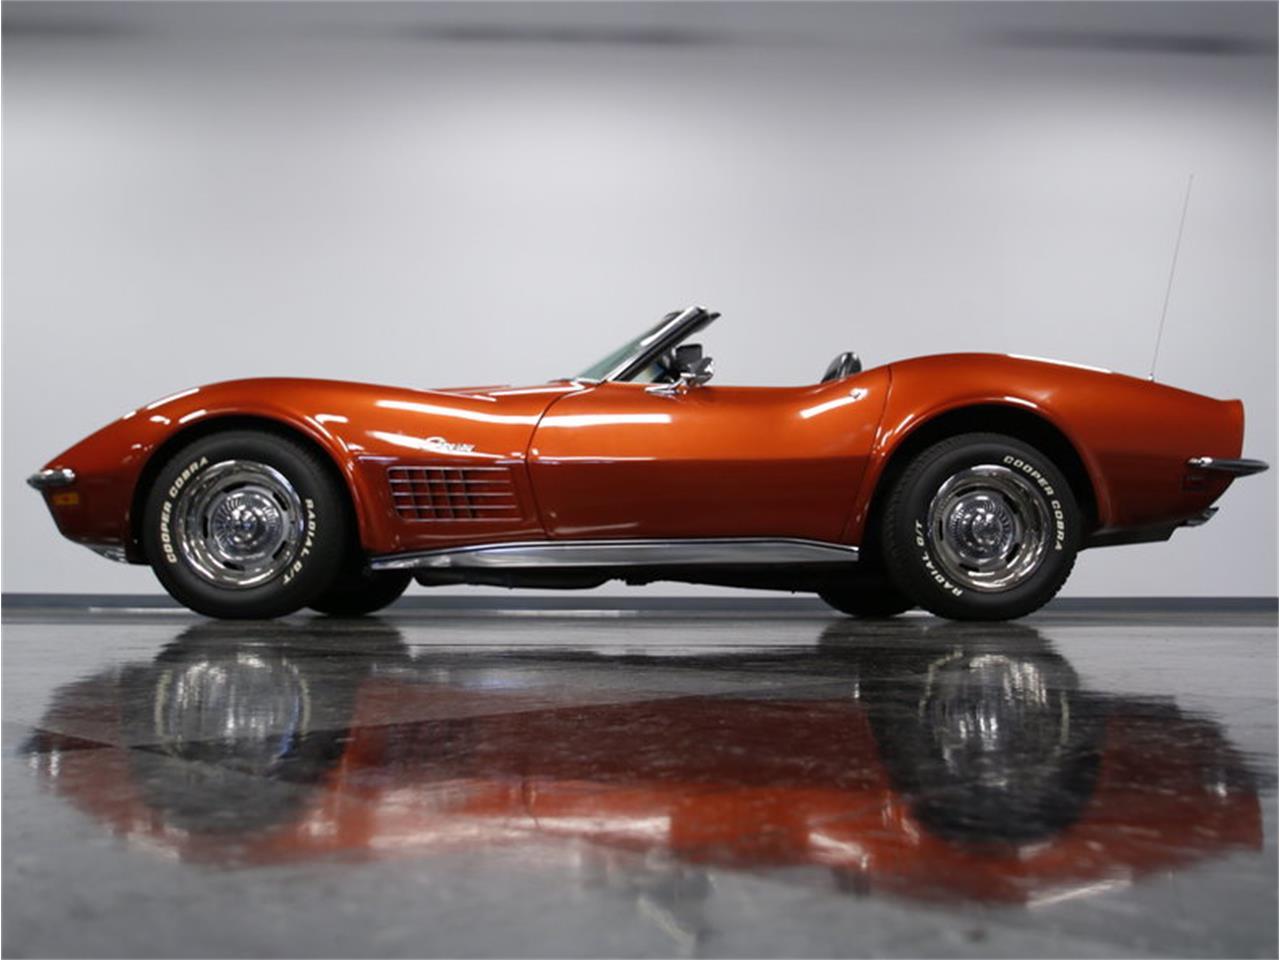 Large Picture of Classic 1970 Corvette located in Concord North Carolina - $27,995.00 Offered by Streetside Classics - Charlotte - JTQZ